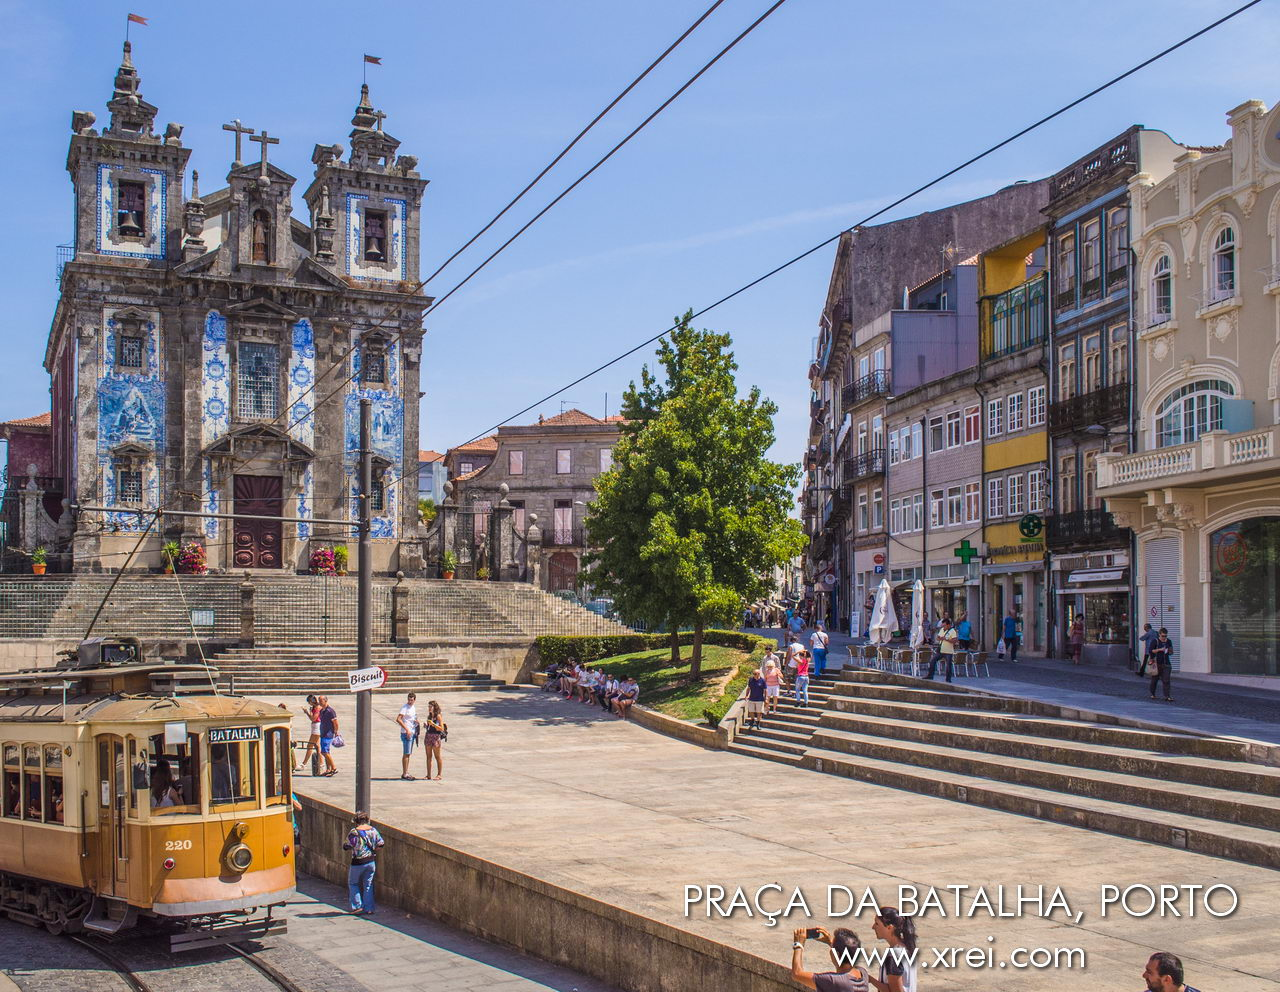 Plaza Batalha con la Iglesia de Santo Ildefonso y el tranvía típico de Oporto